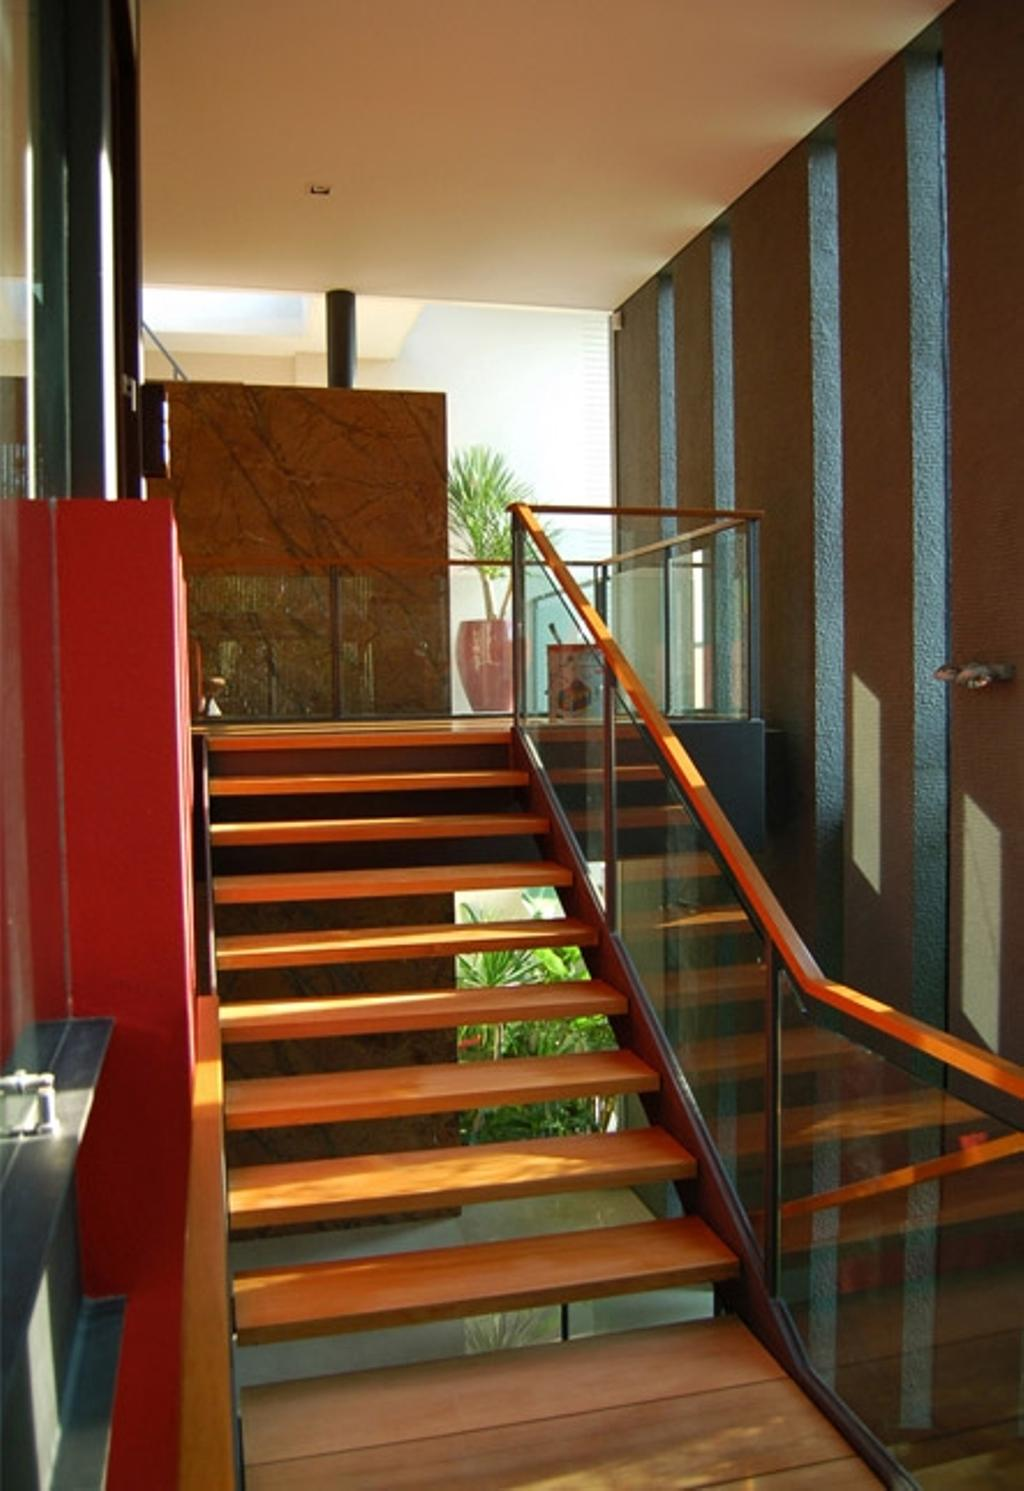 Contemporary, Landed, Mount Echo Park, Architect, Timur Designs, Flora, Jar, Plant, Potted Plant, Pottery, Vase, Banister, Handrail, Staircase